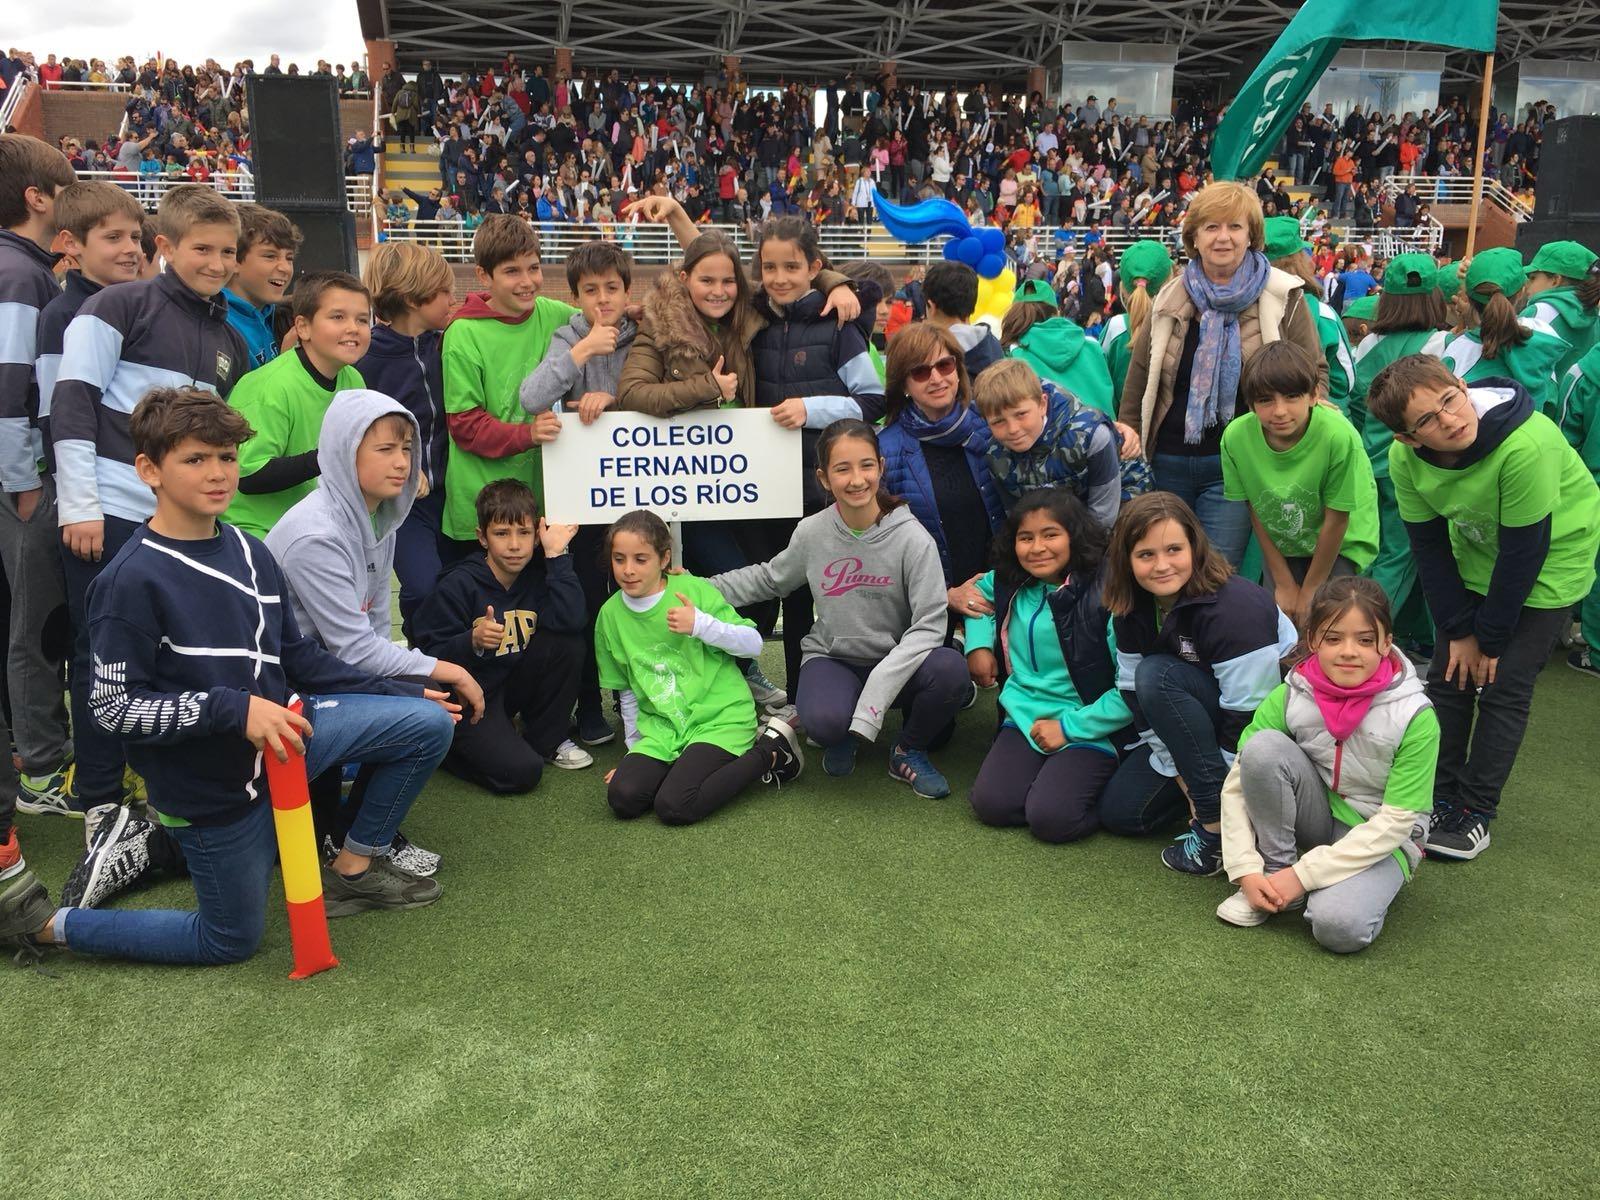 2018-04-09_Olimpiadas Escolares_CEIP FDLR_Las Rozas_Desfile 6